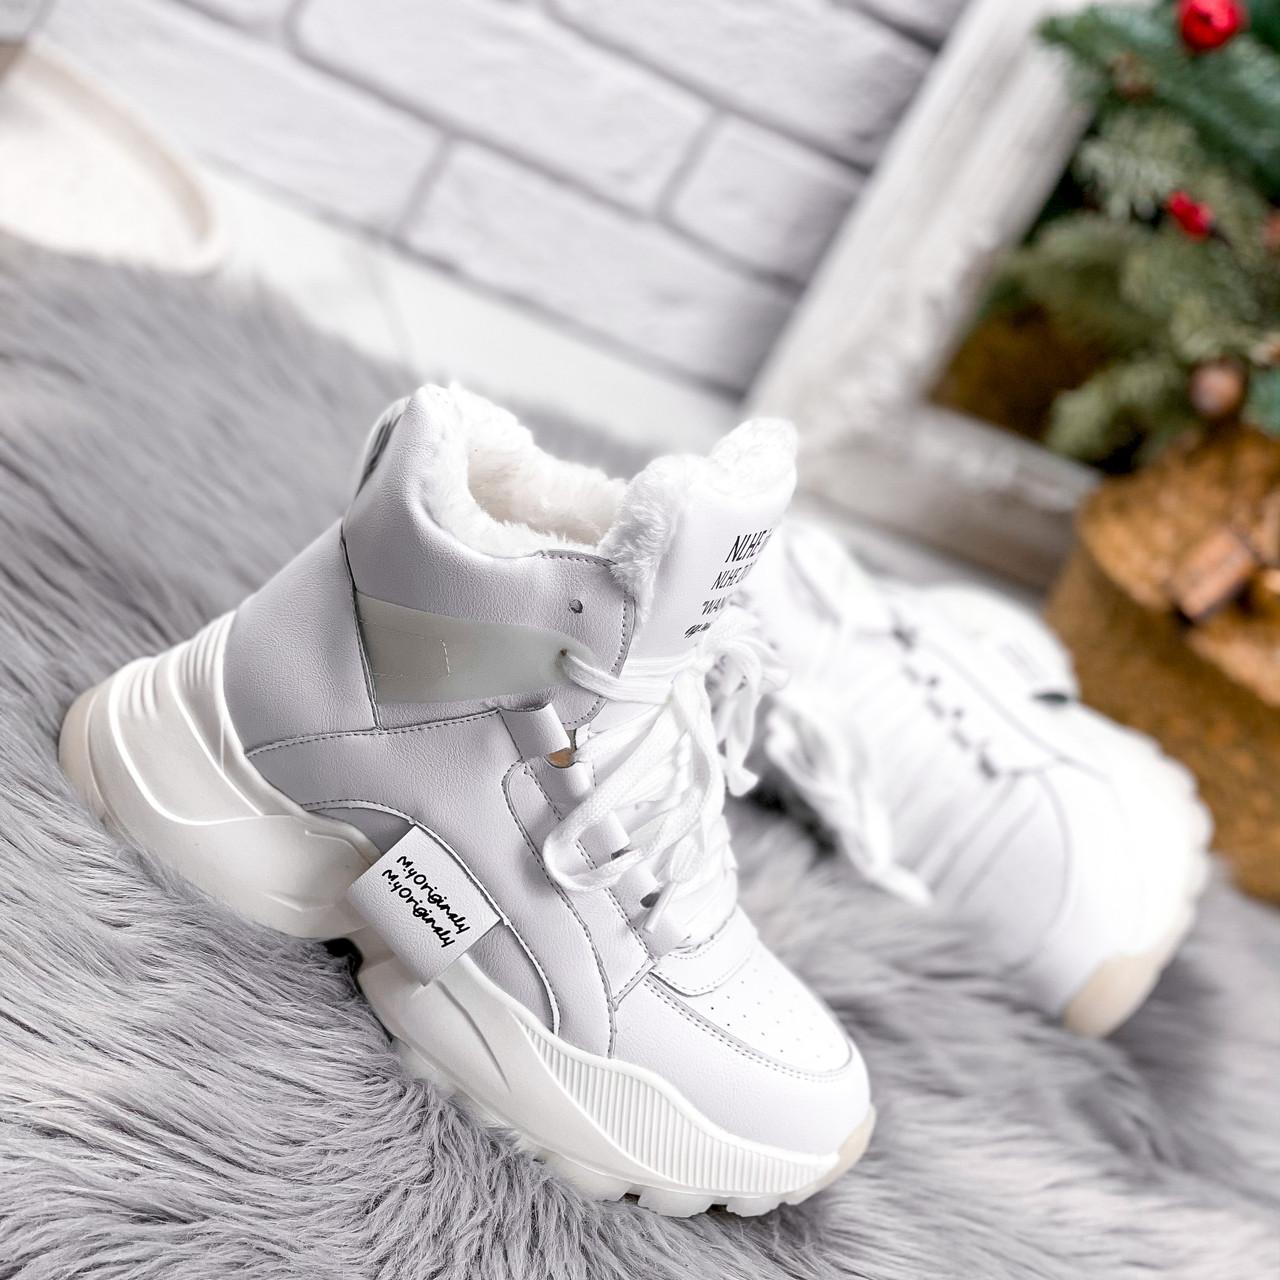 Ботинки женские Tress белые 2702